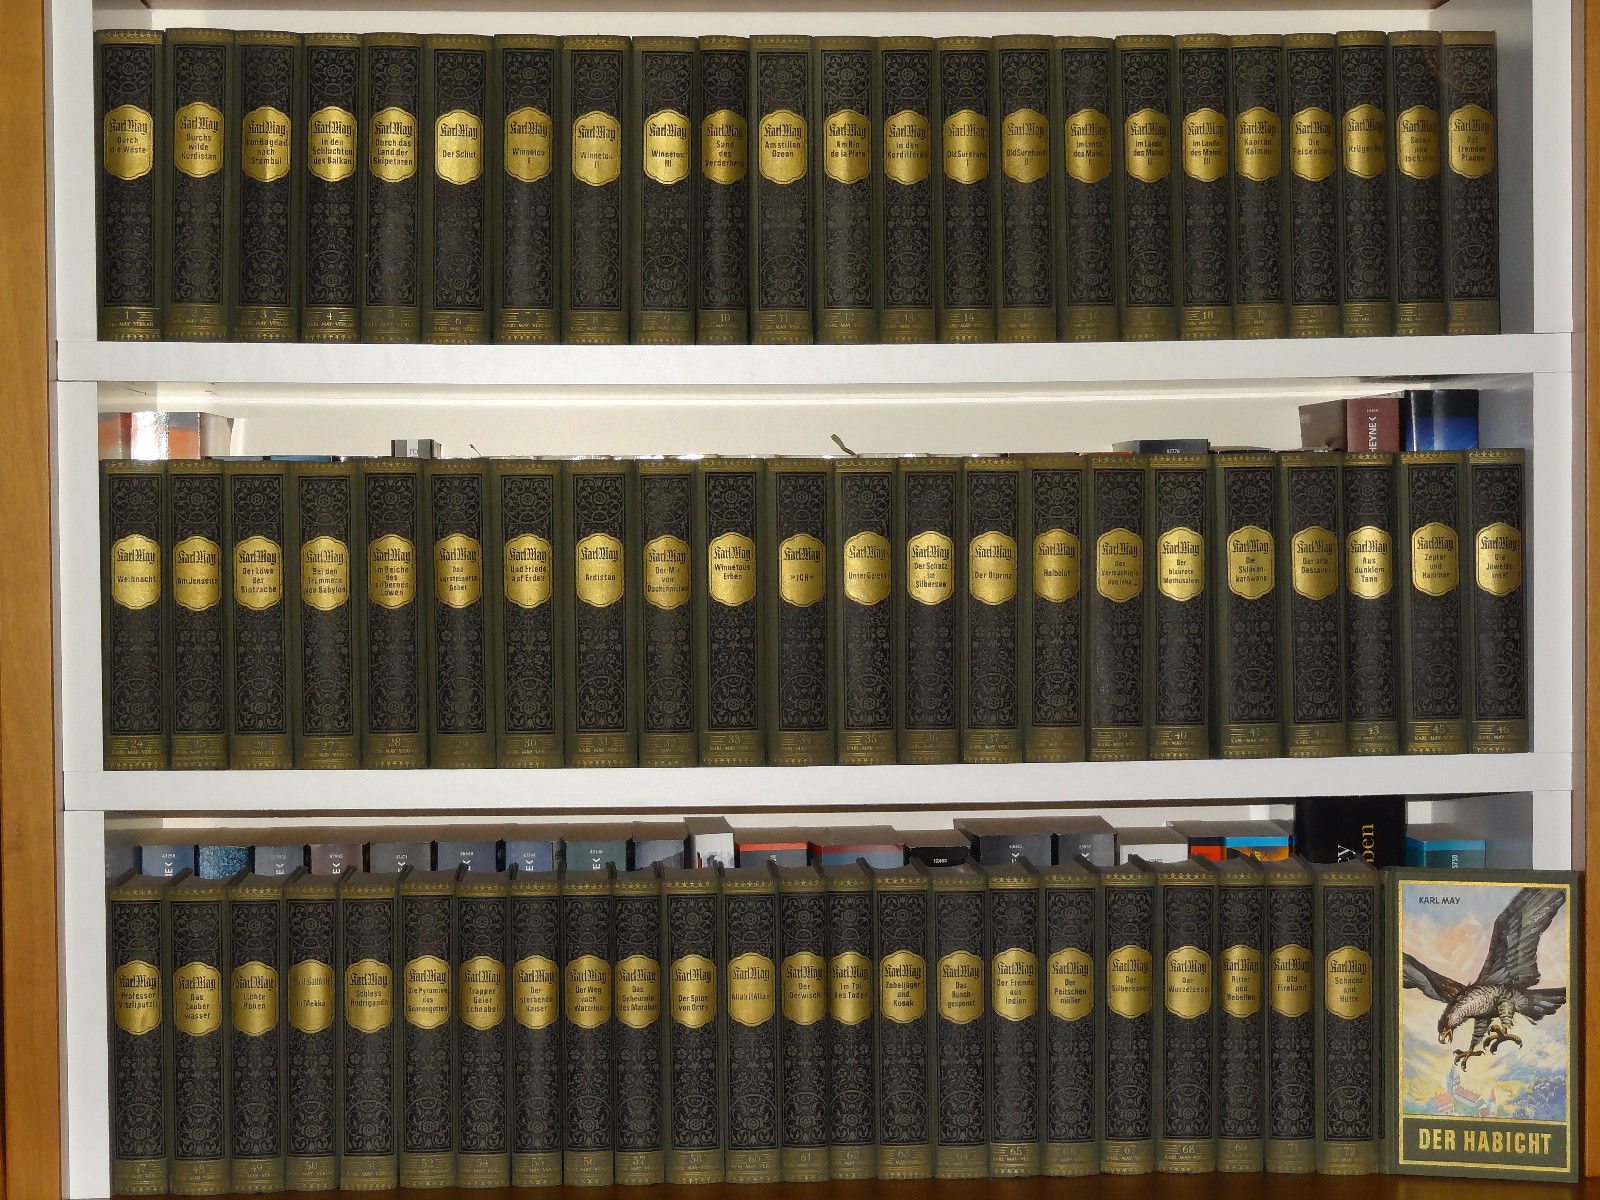 Alte Karl May Sammlung 69 Stück, Hardcover